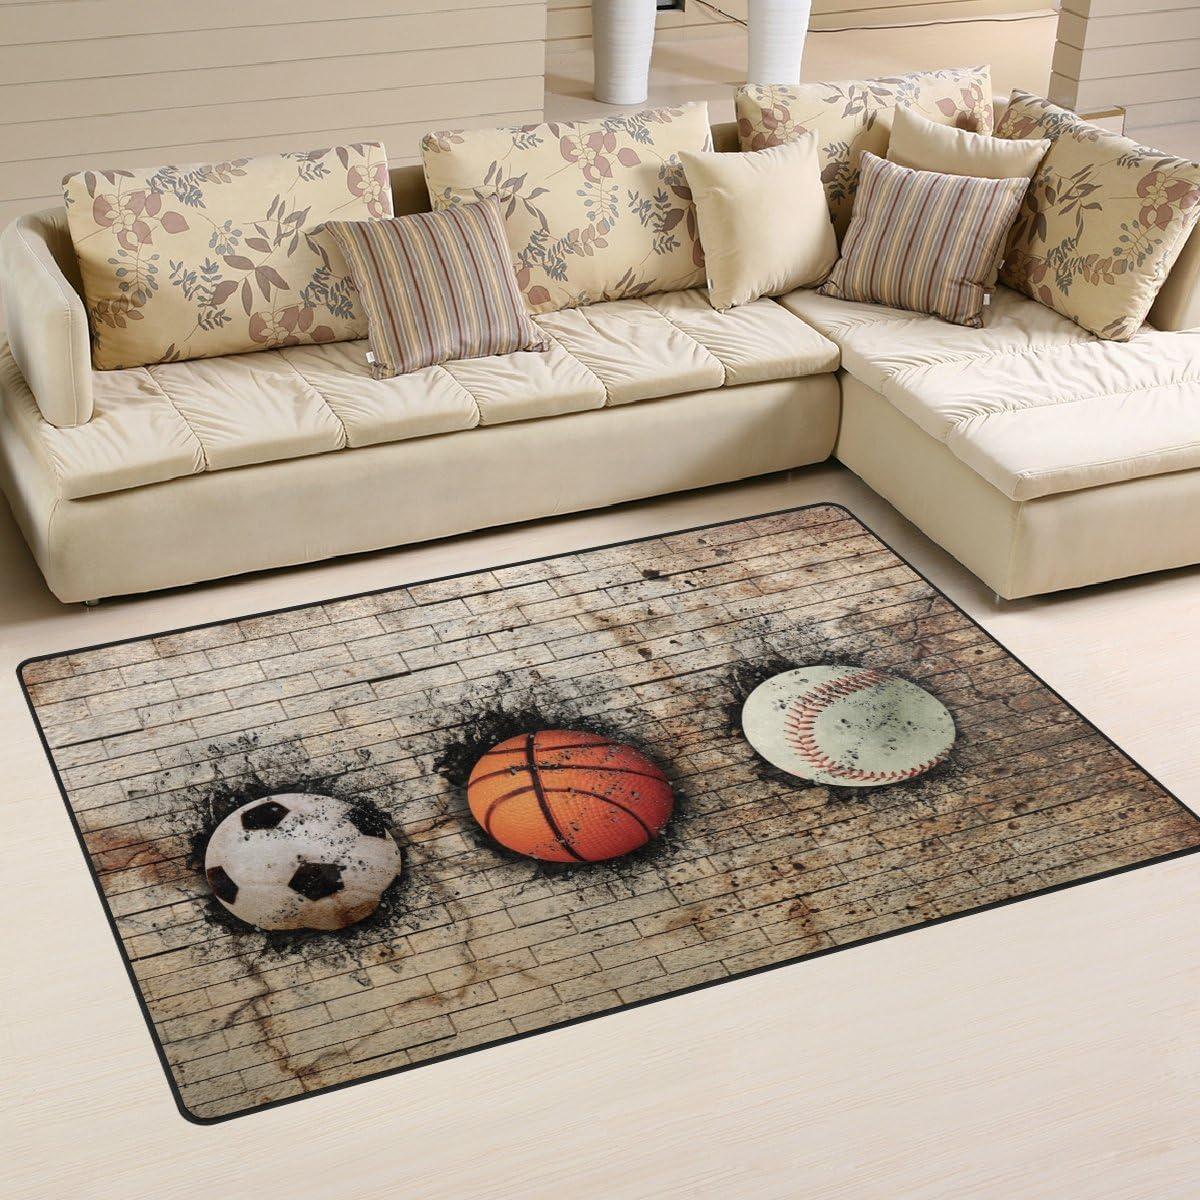 WOZO Vintage 3D Basketball Baseball Soccer Area Rug Rugs Non-Slip Floor Mat Doormat